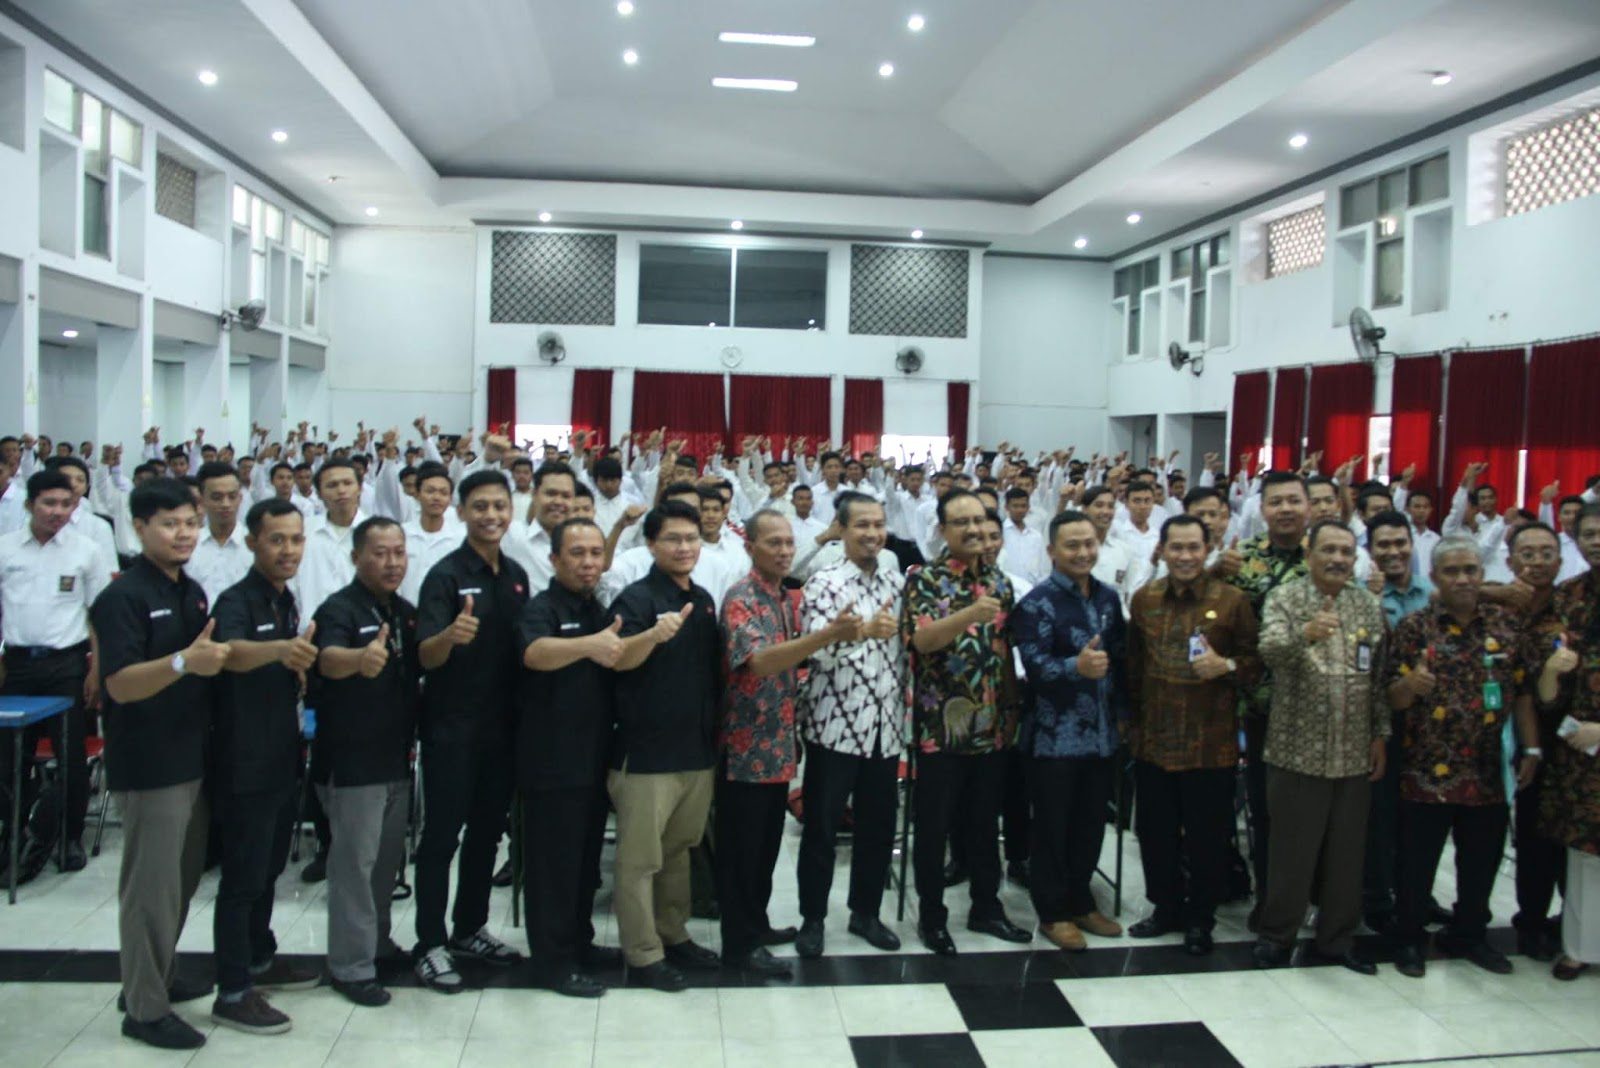 Lowongan Kerja Operator Produksi Sma Smk Smu 2020 Pt Astra